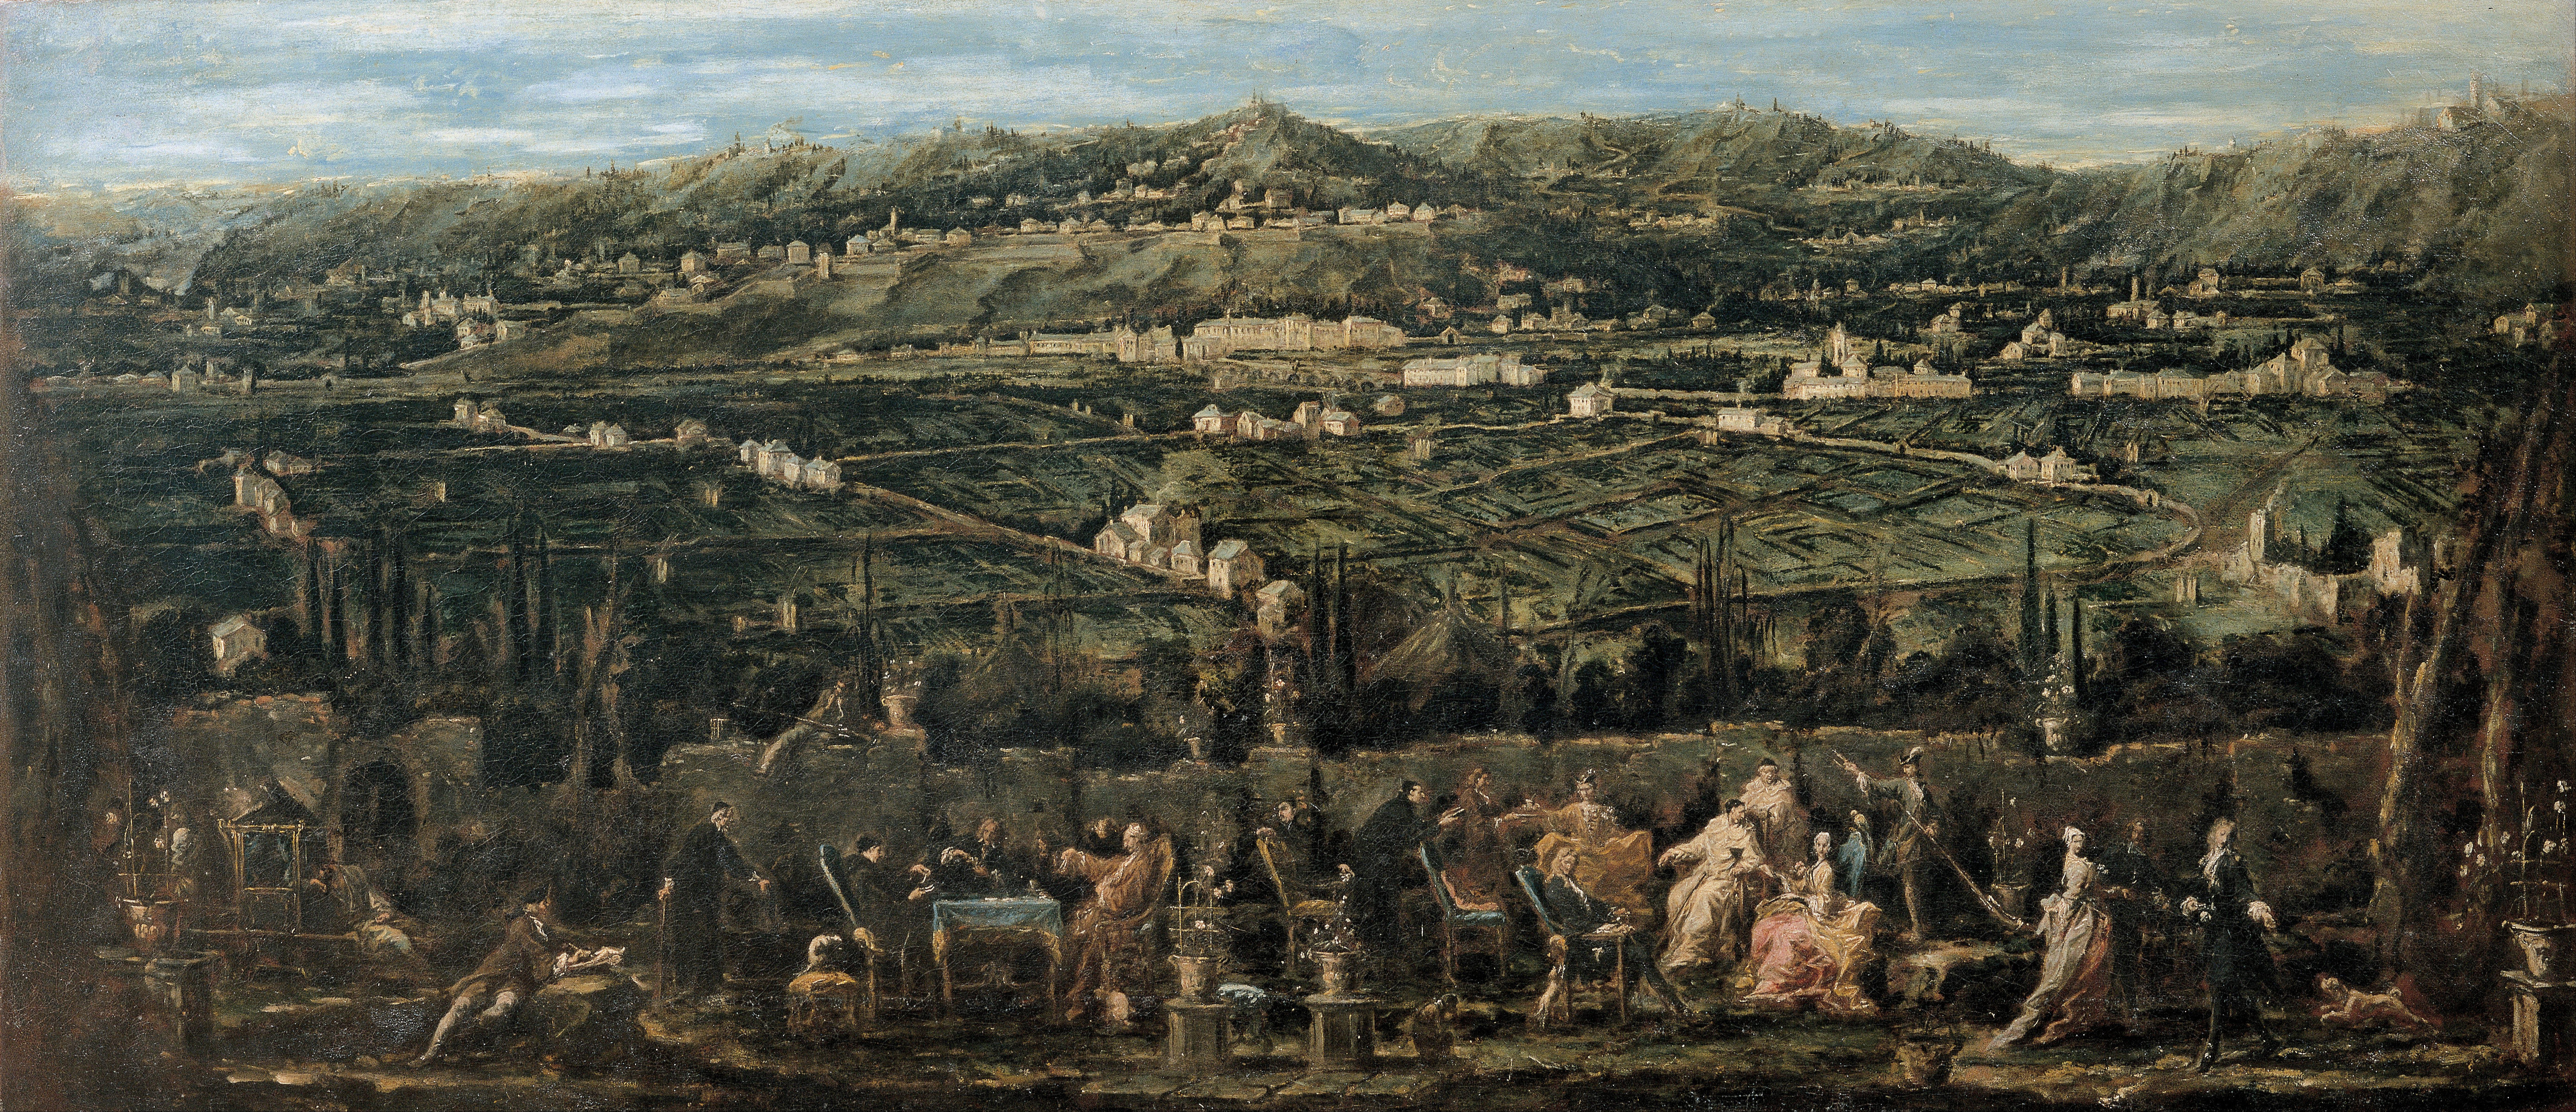 File:Alessandro Magnasco - Garden Party in Albaro - Google Art ...